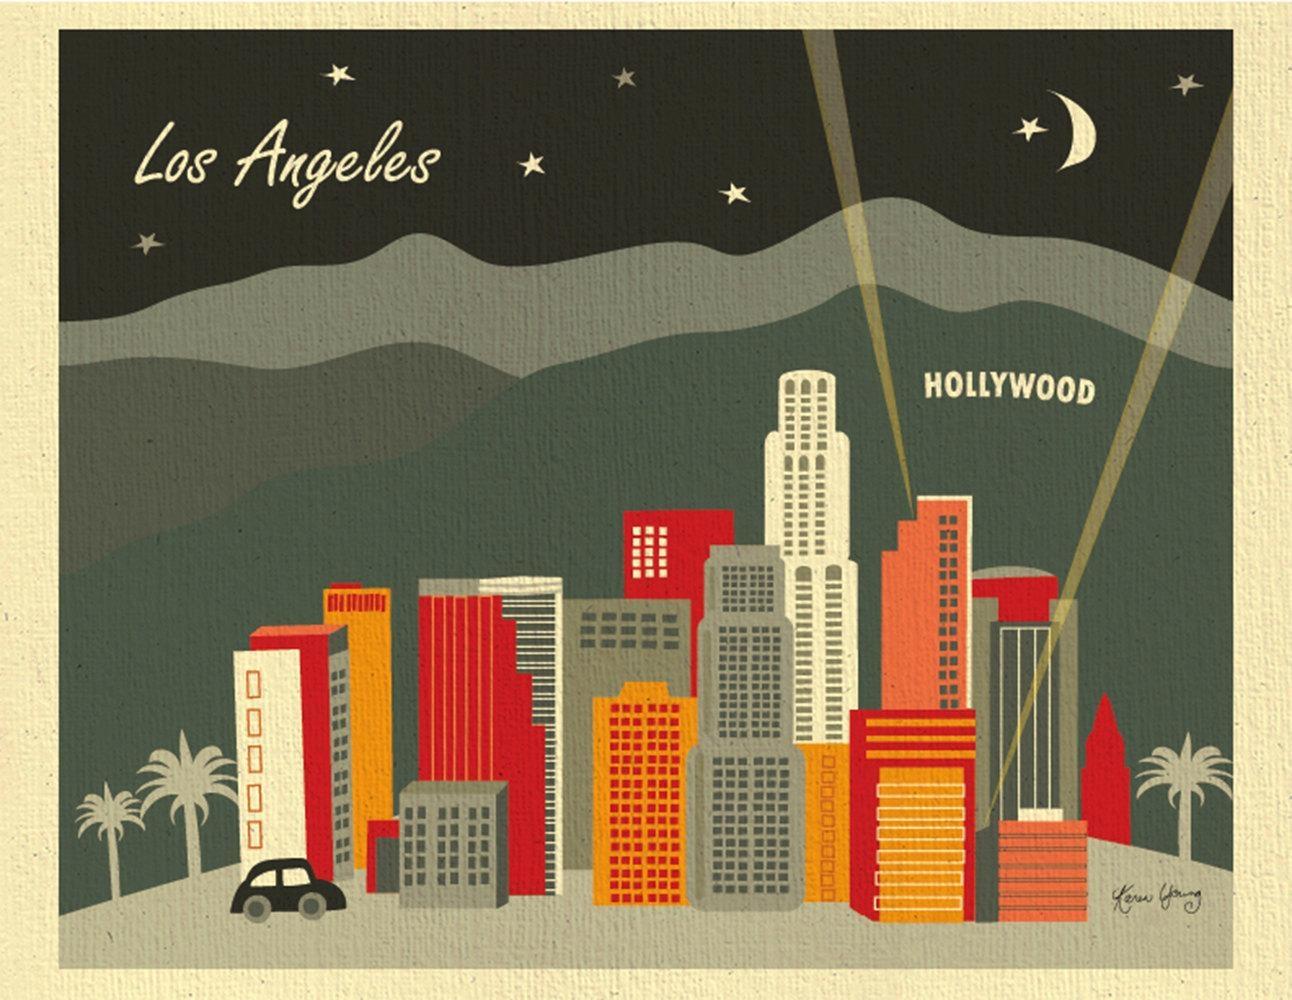 Los Angeles Skyline Art Print Hollywood Wall Art La Art Regarding Los Angeles Wall Art (Image 12 of 20)